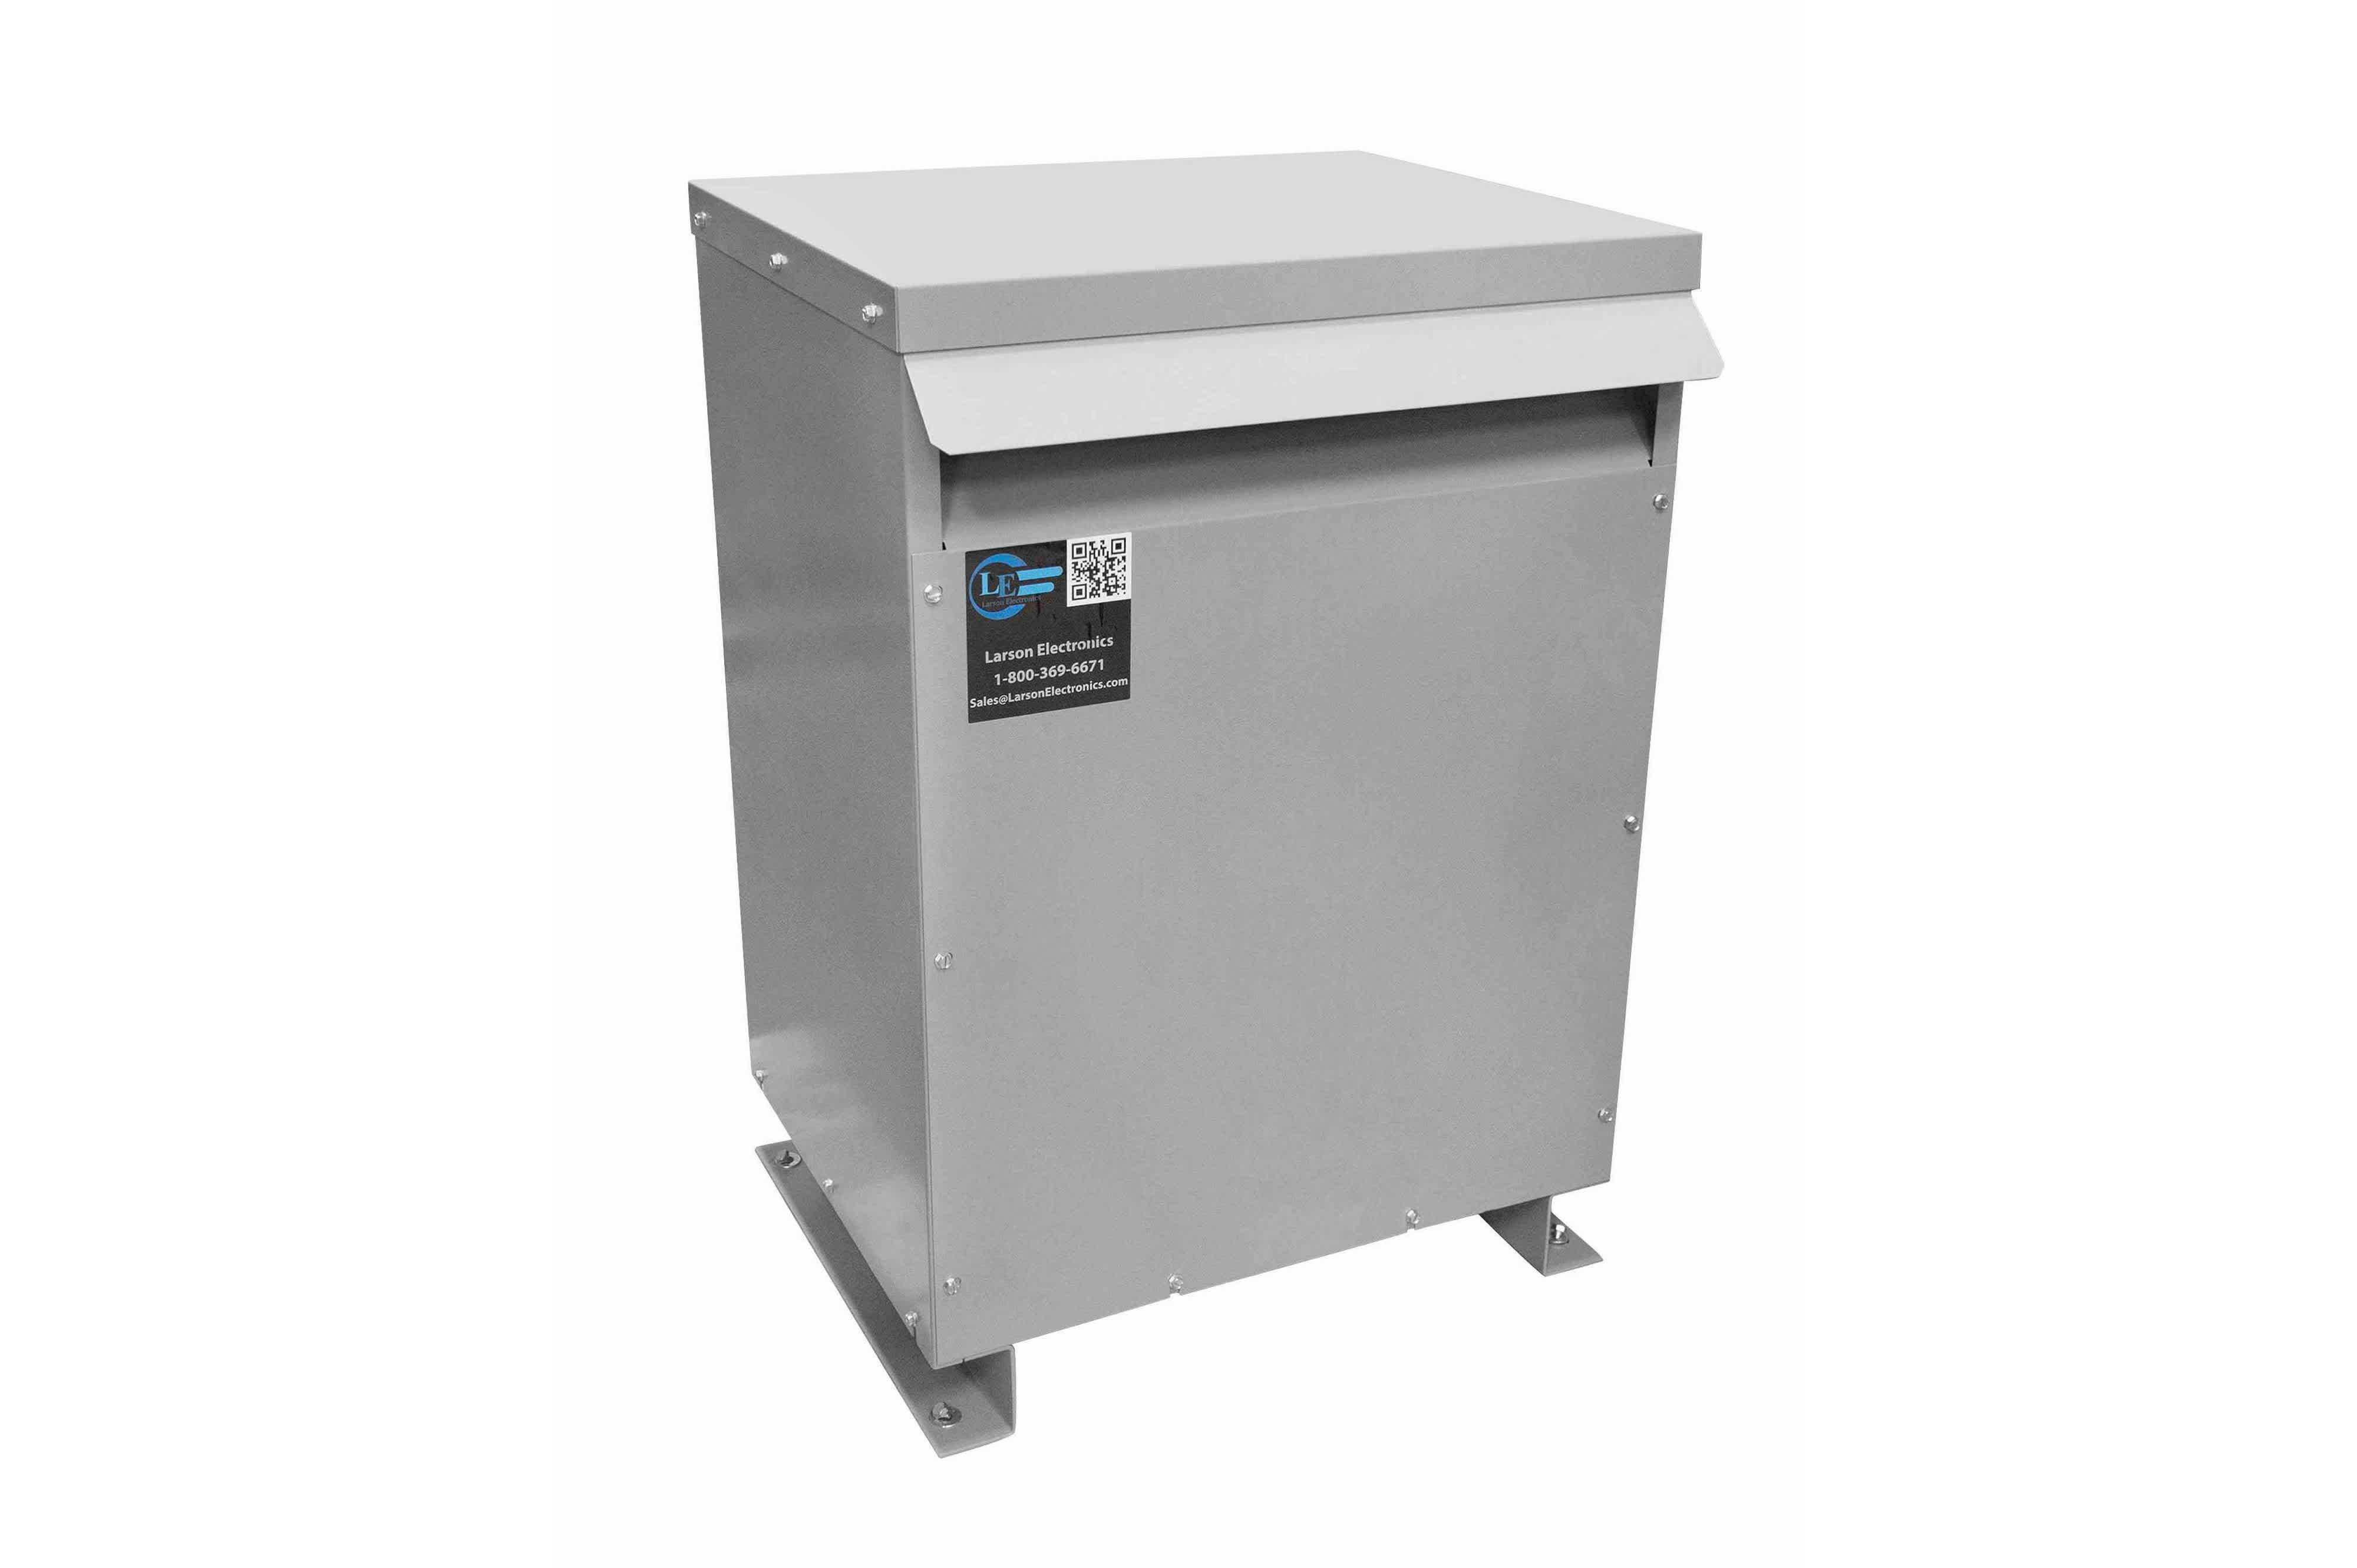 700 kVA 3PH Isolation Transformer, 240V Wye Primary, 415Y/240 Wye-N Secondary, N3R, Ventilated, 60 Hz